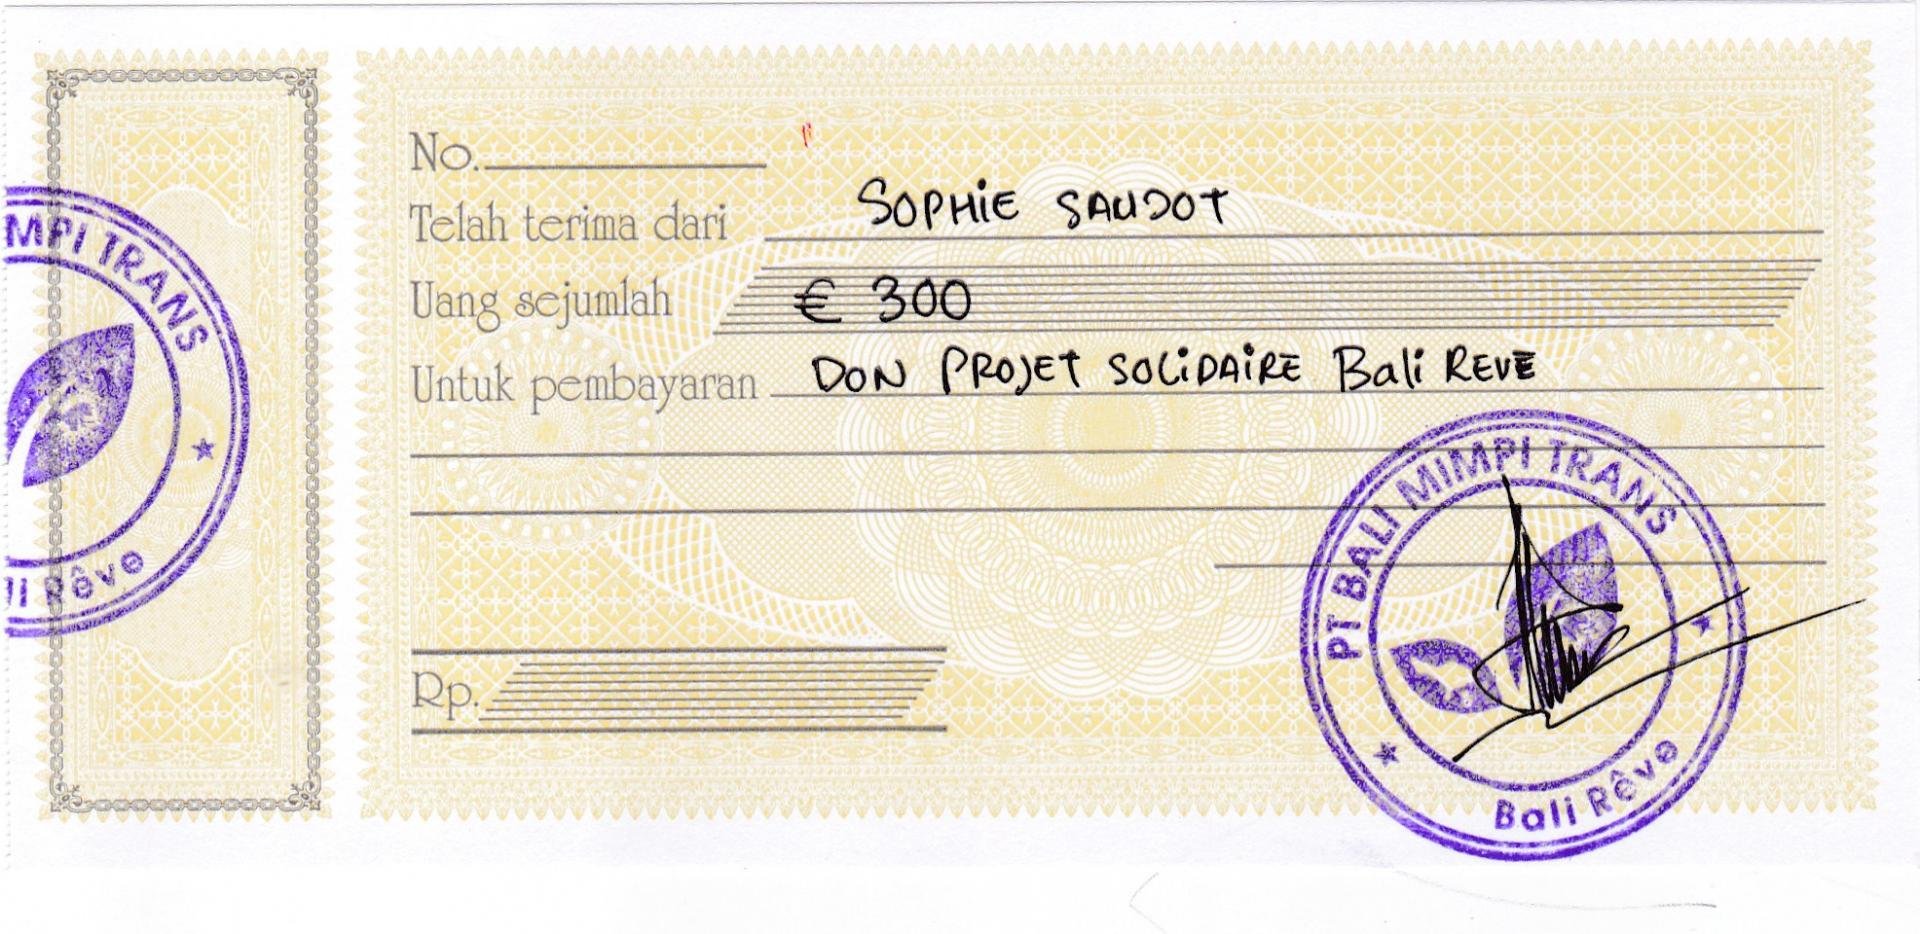 Don sophie saujot